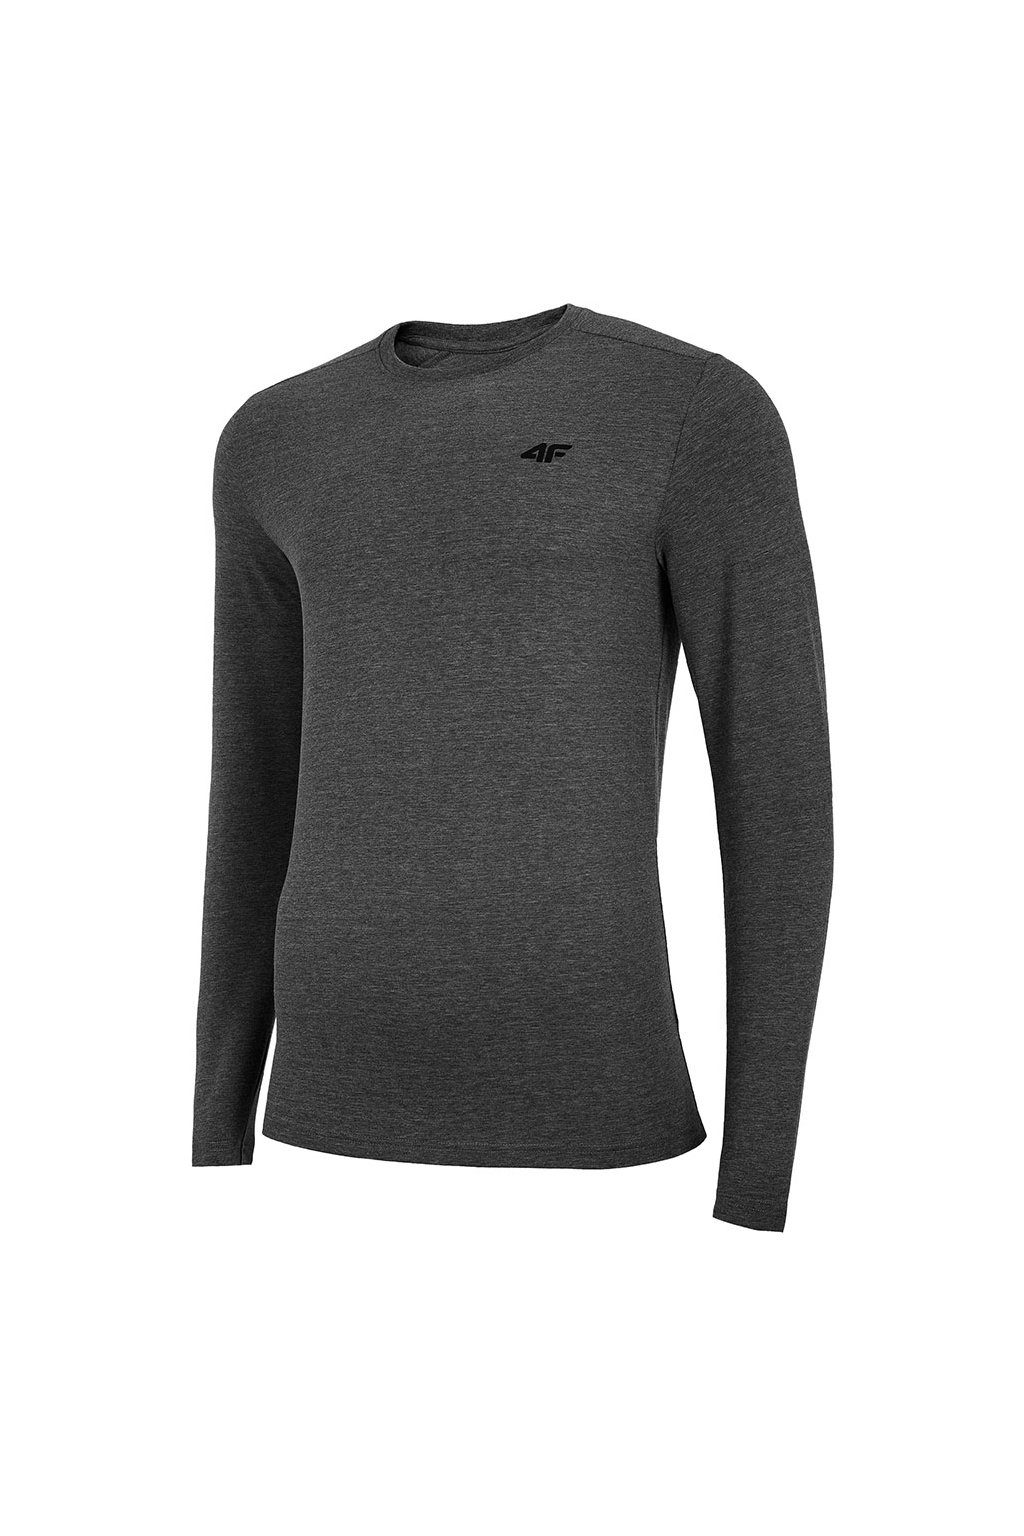 Pánske tričko 4F sivé NOSH4 TSML001 24M